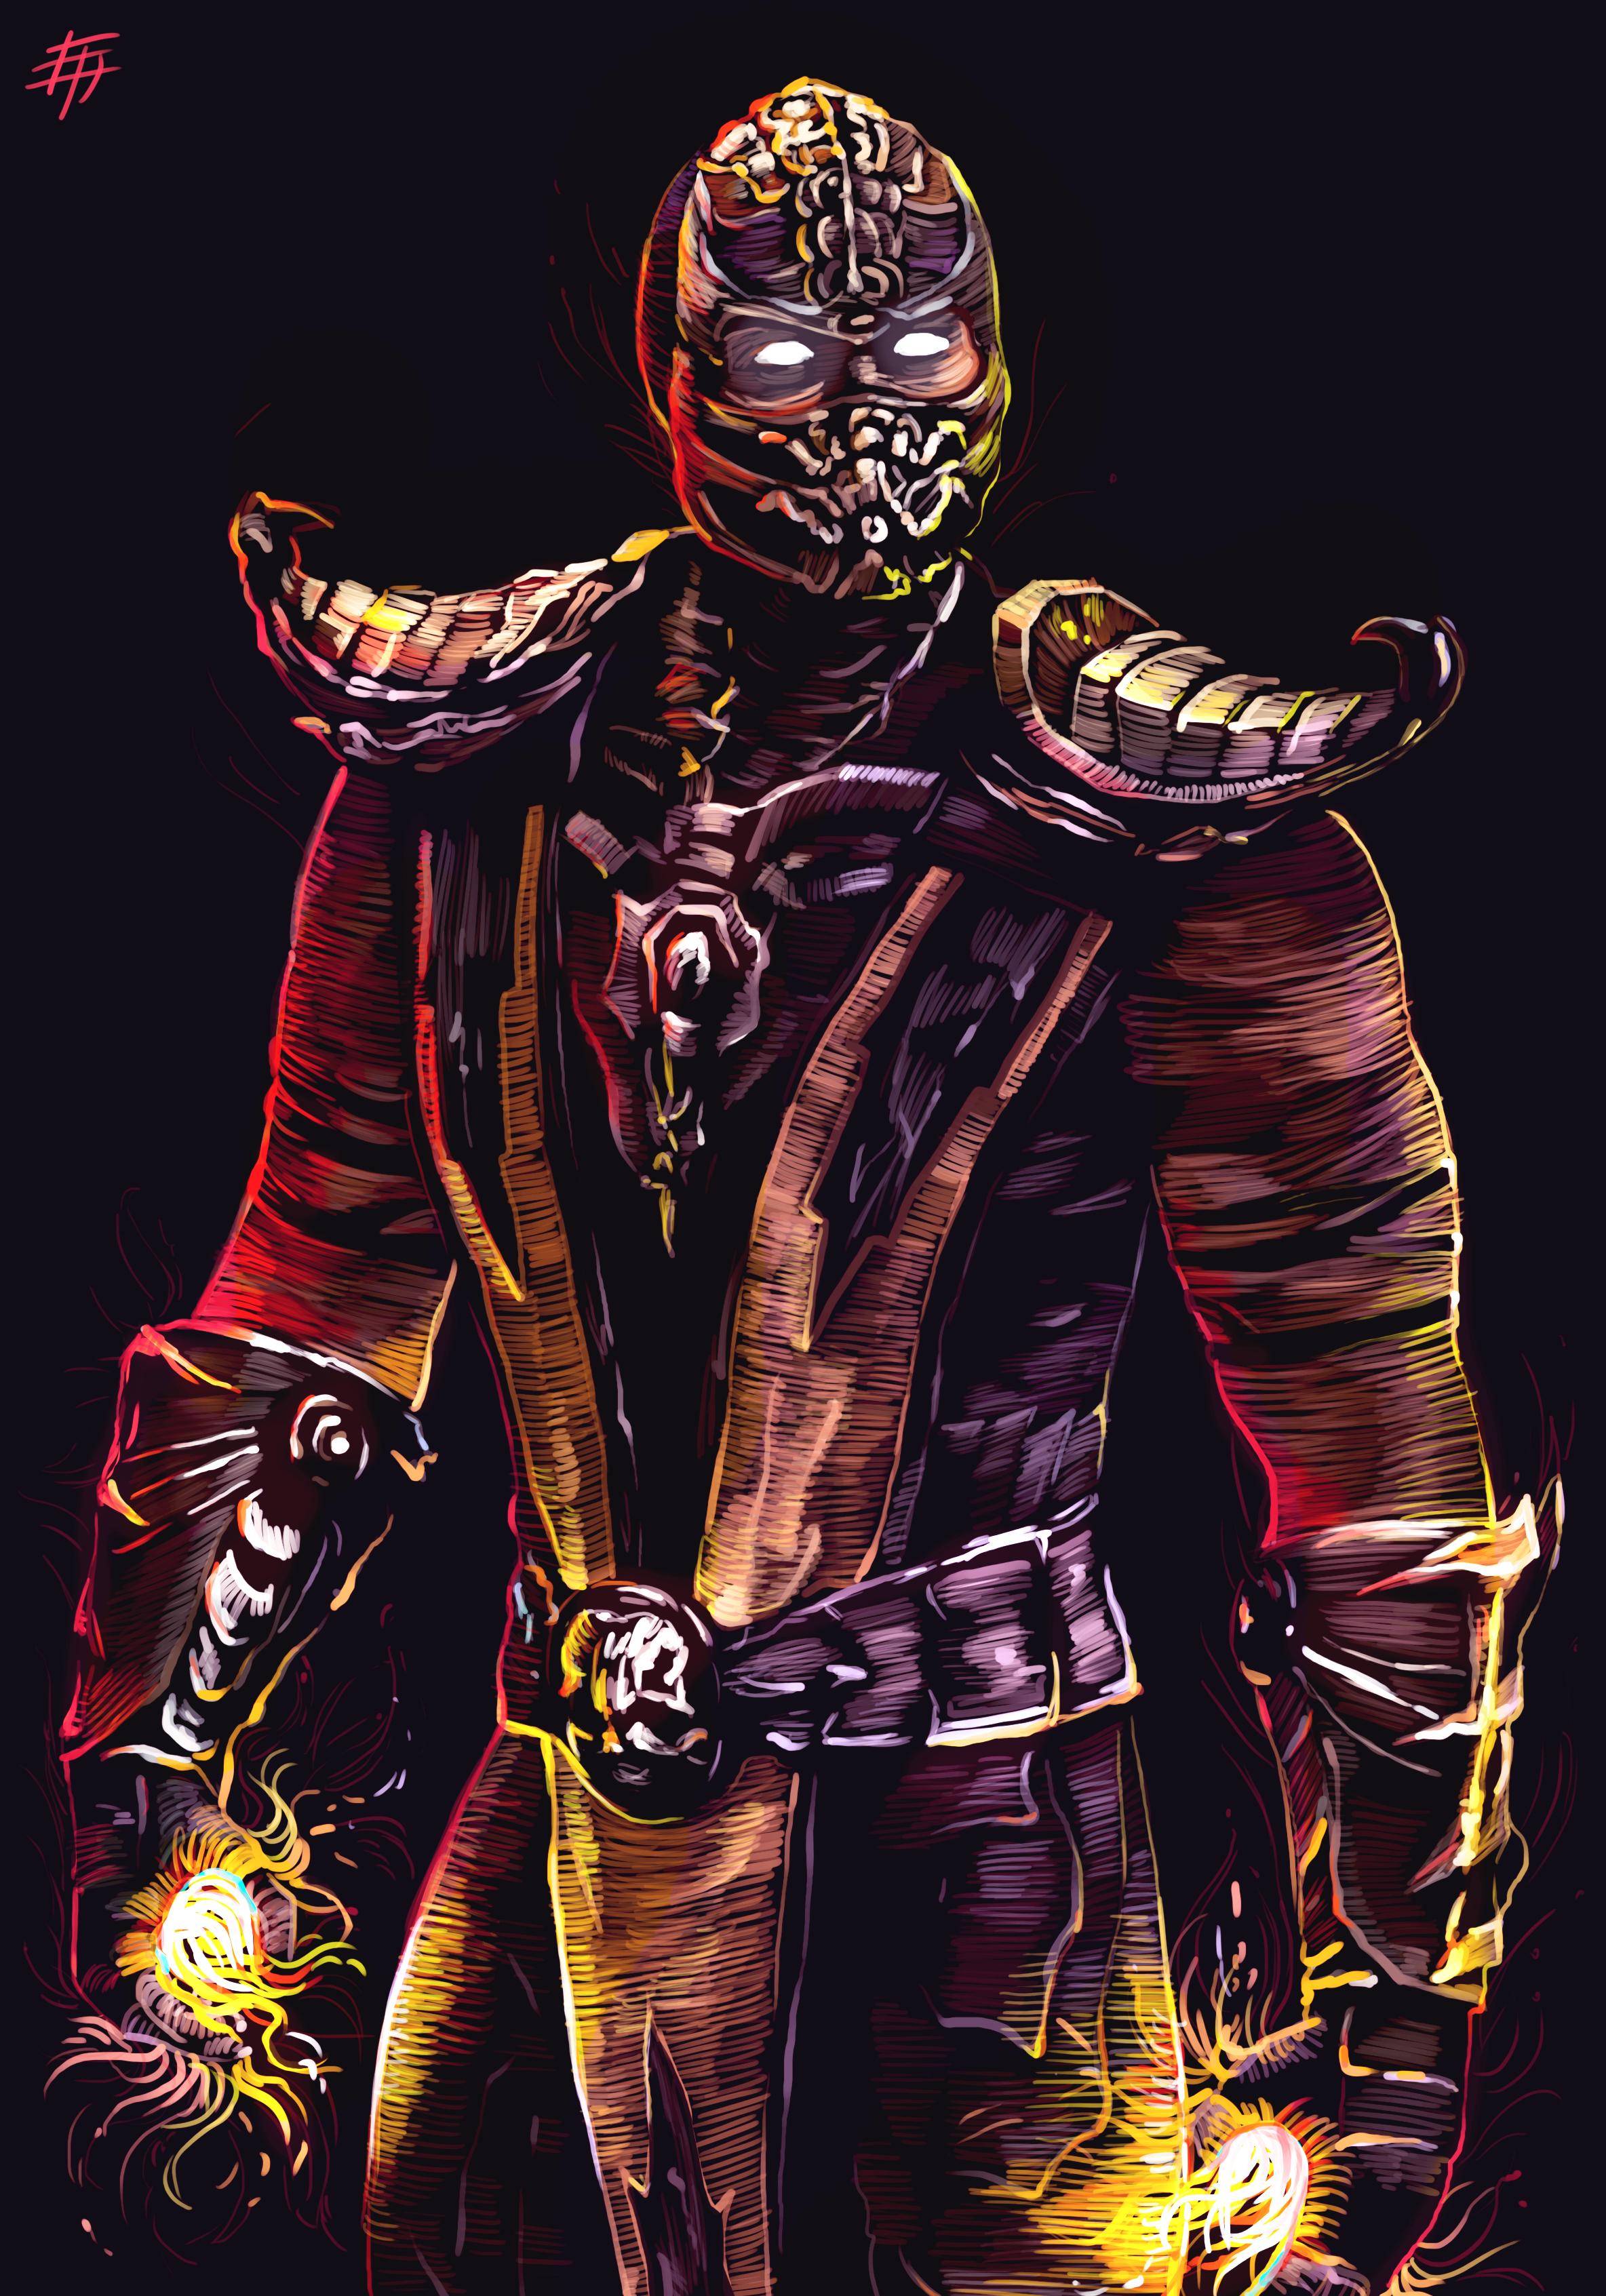 Scorpion Mortal Kombat Image 2579710 Zerochan Anime Image Board